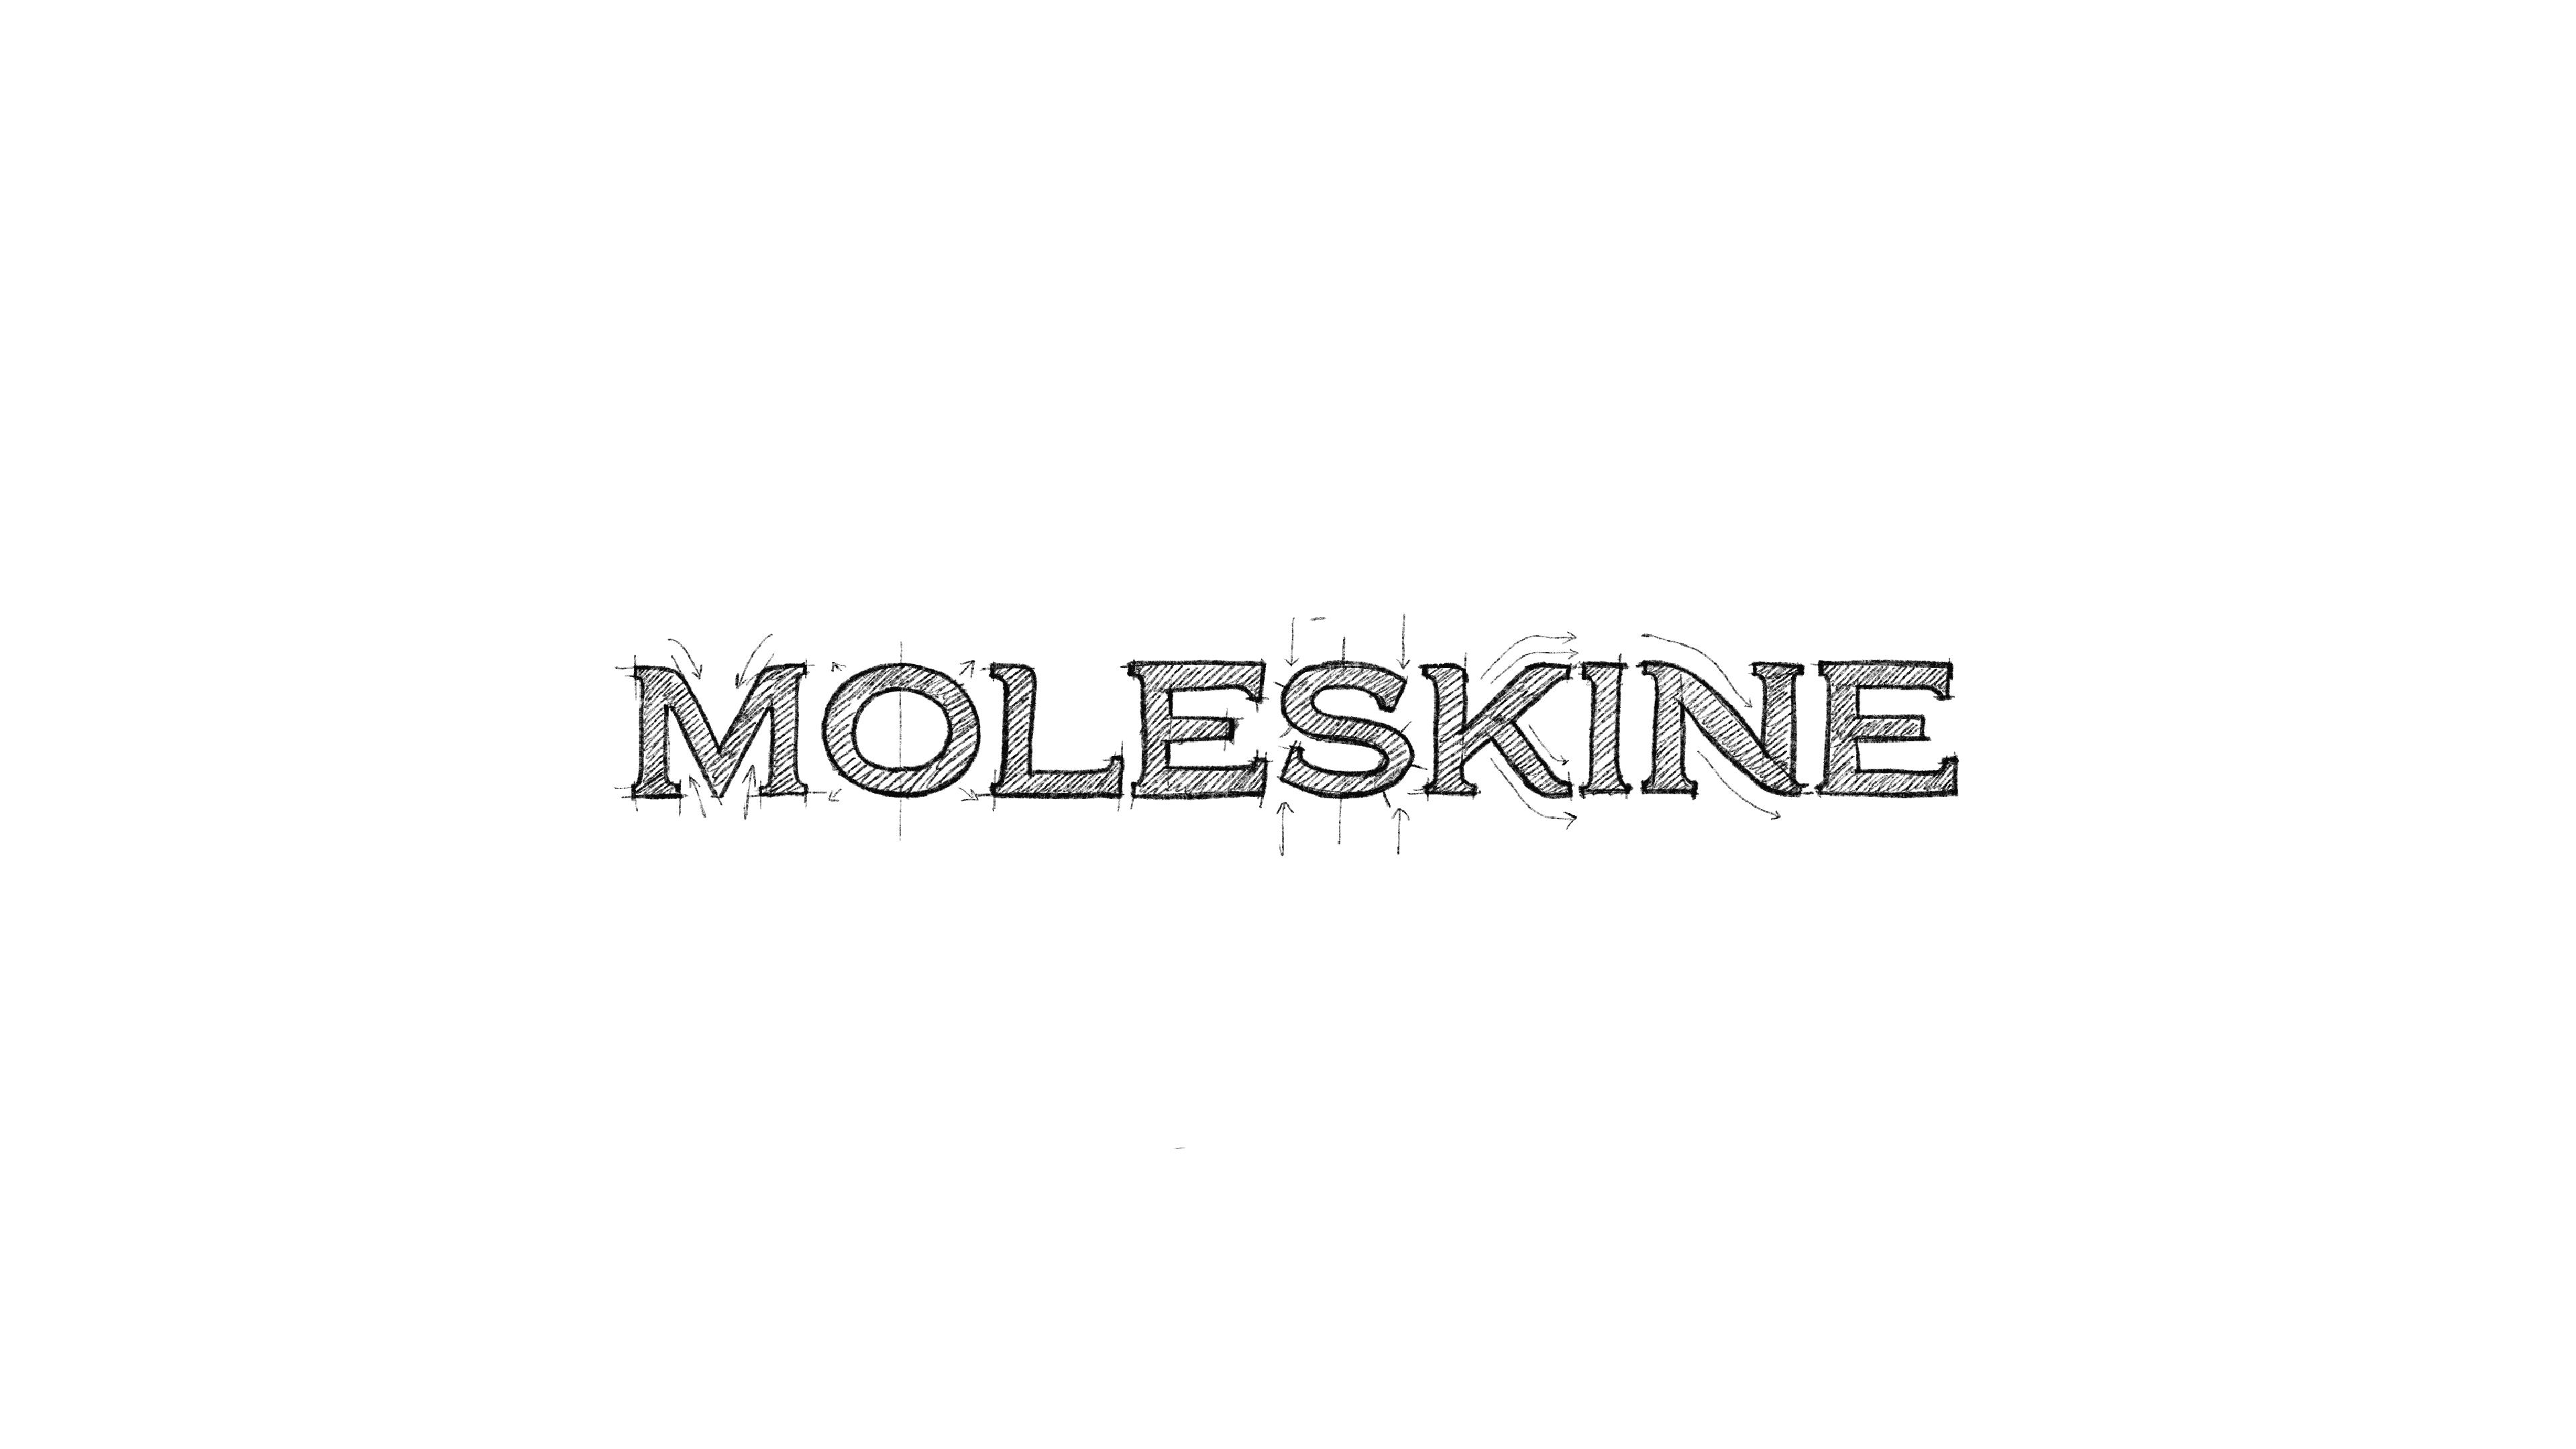 MOLESKINE-brand-identity-02